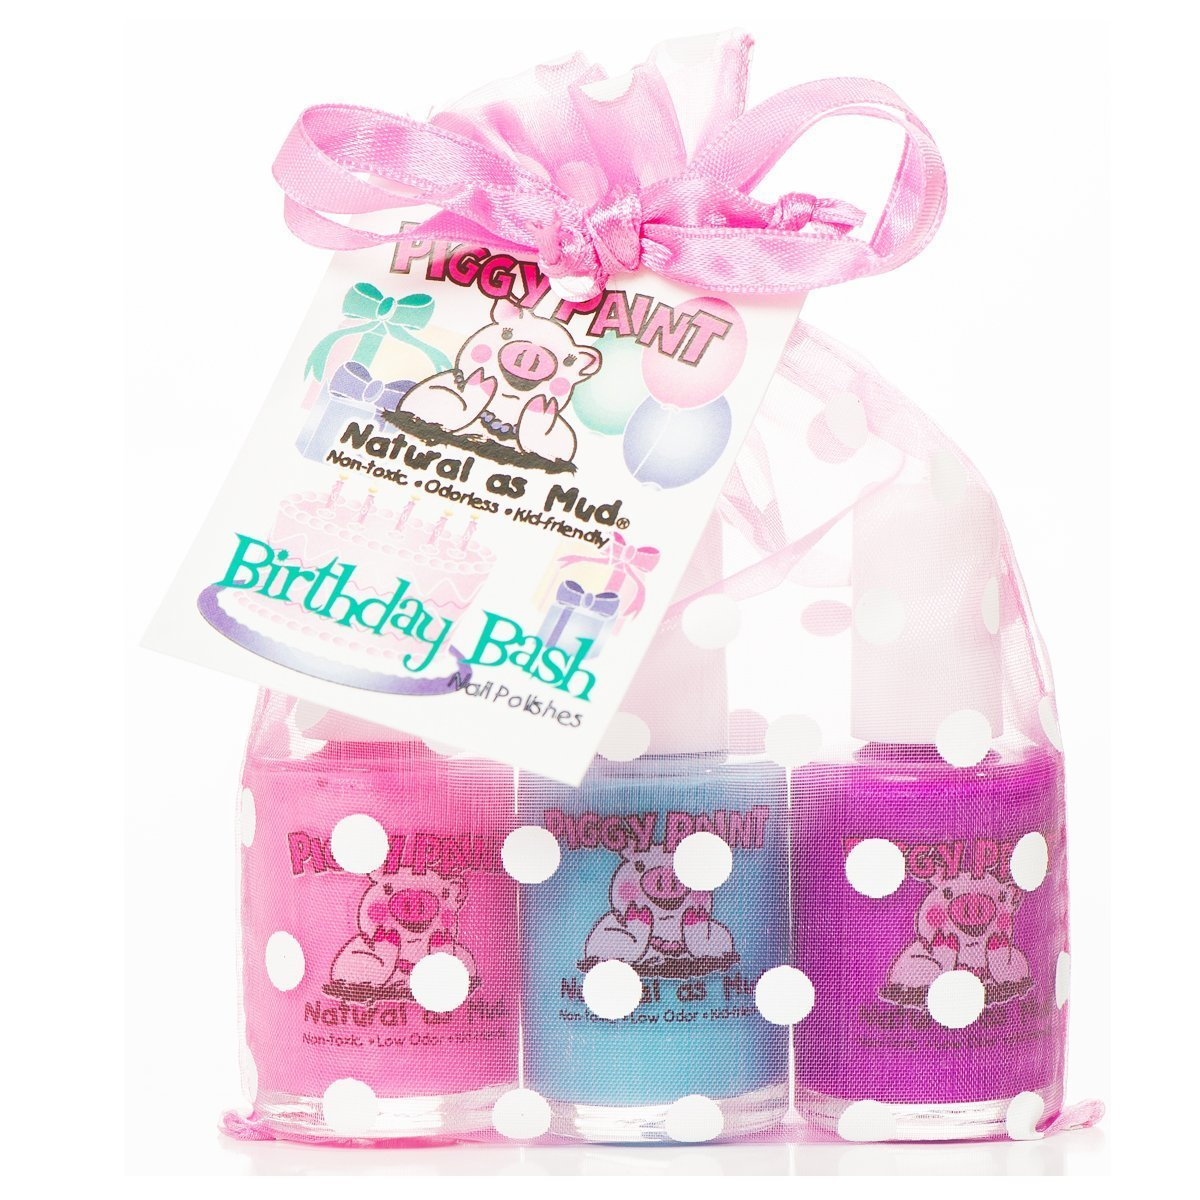 Piggy Paint Birthday Bash Gift Set, 1 Count 0825